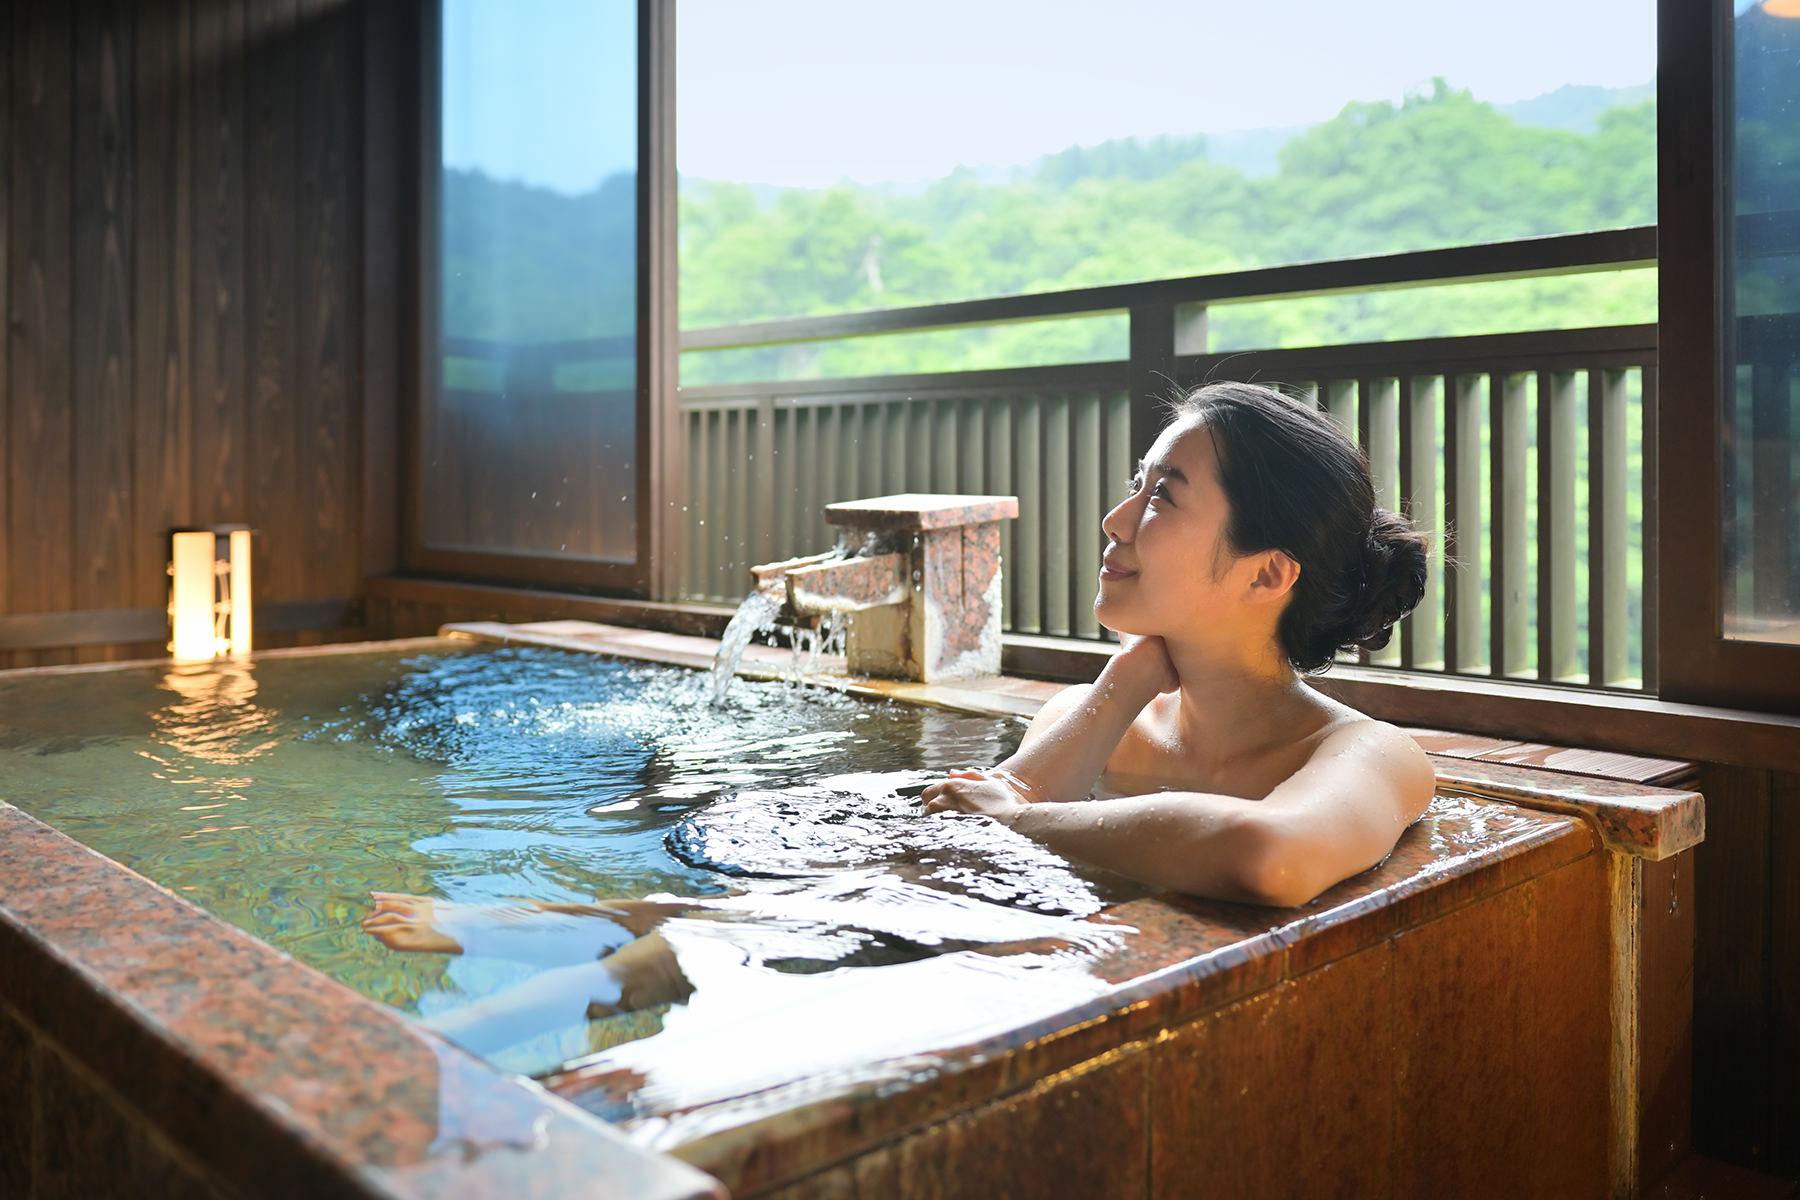 春蘭の二階露天風呂